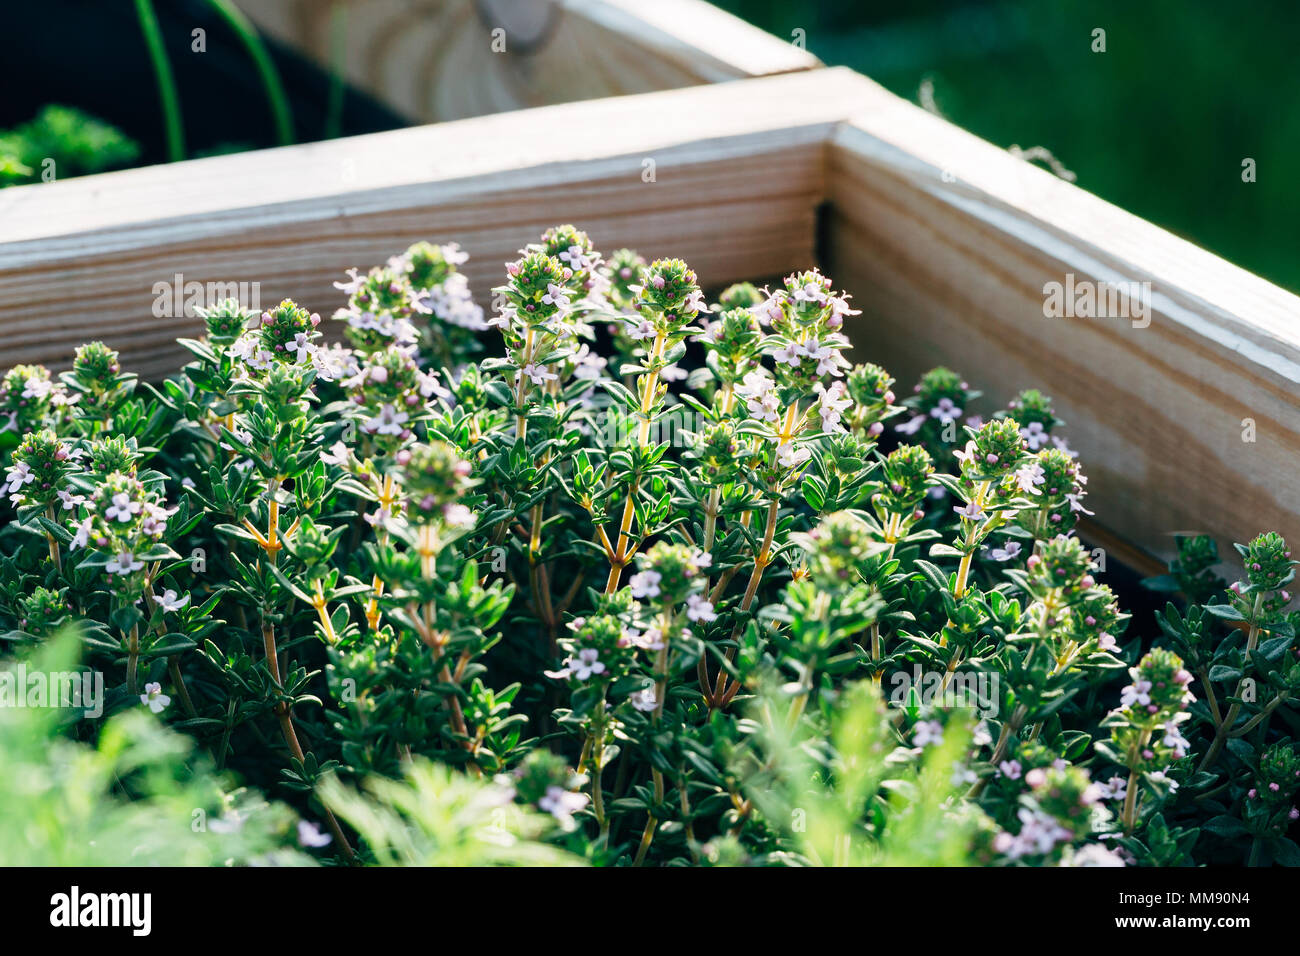 Gros plan du thym herbes en fleurs Photo Stock